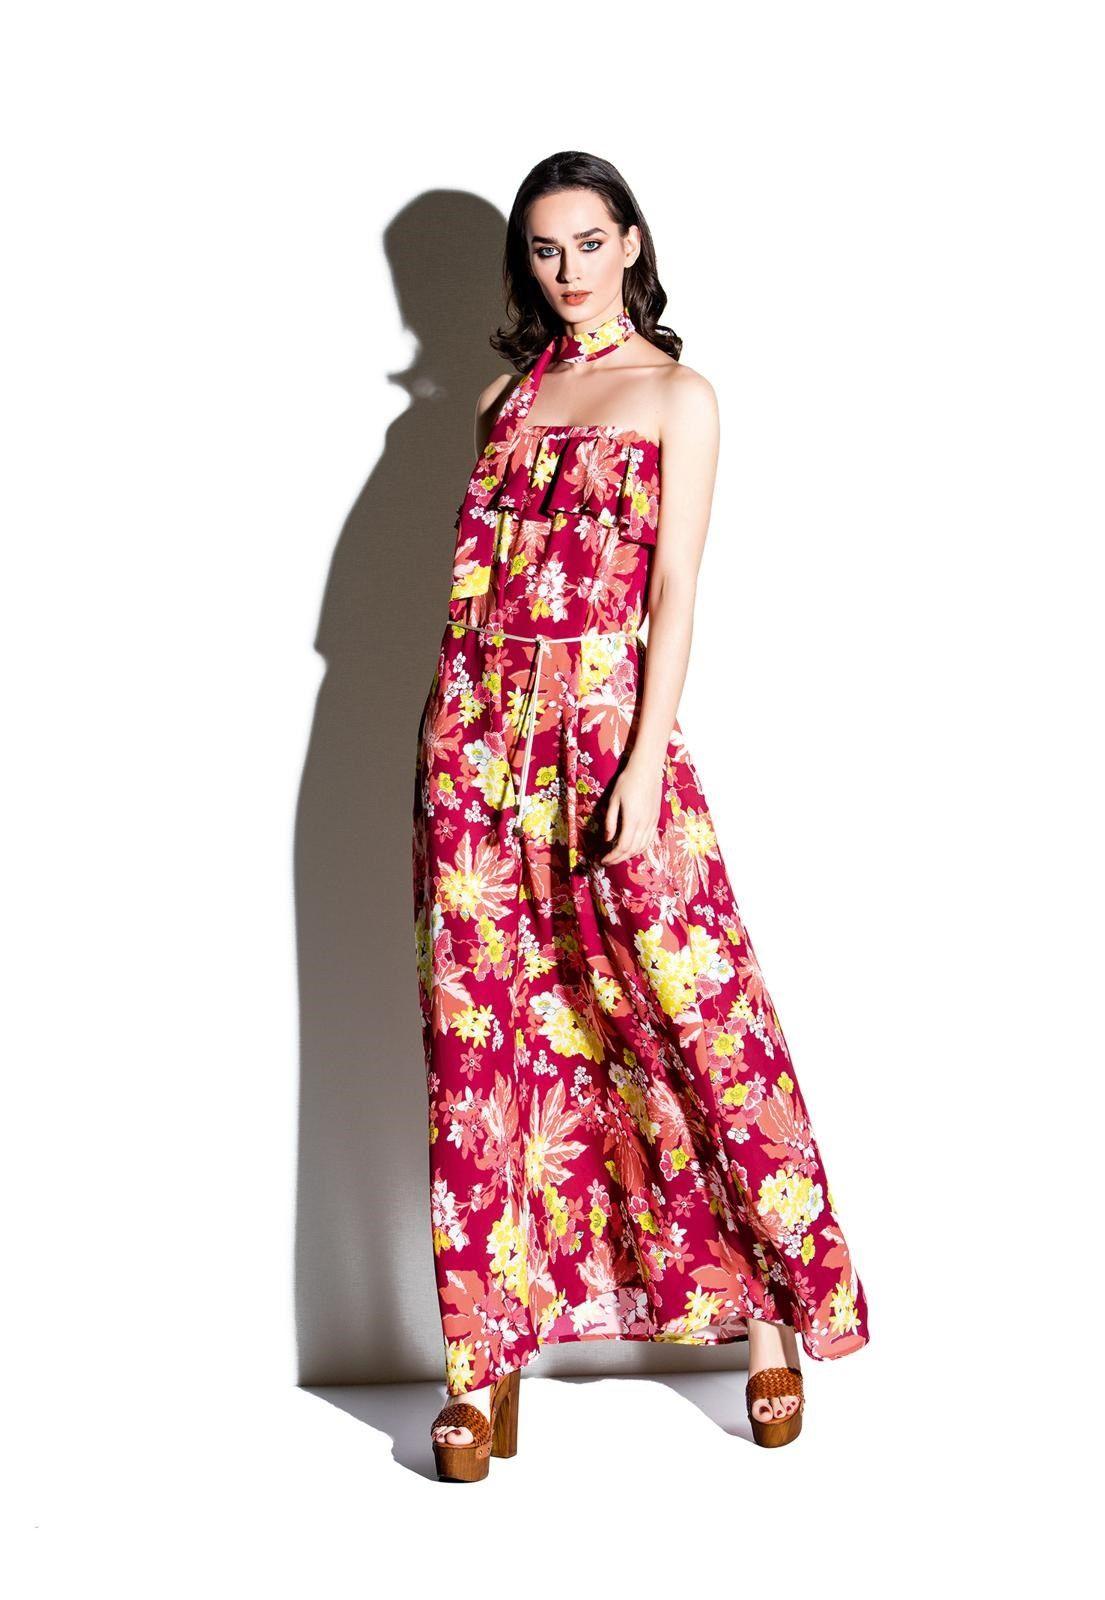 Operà fashion spring summer gowns pinterest fashion